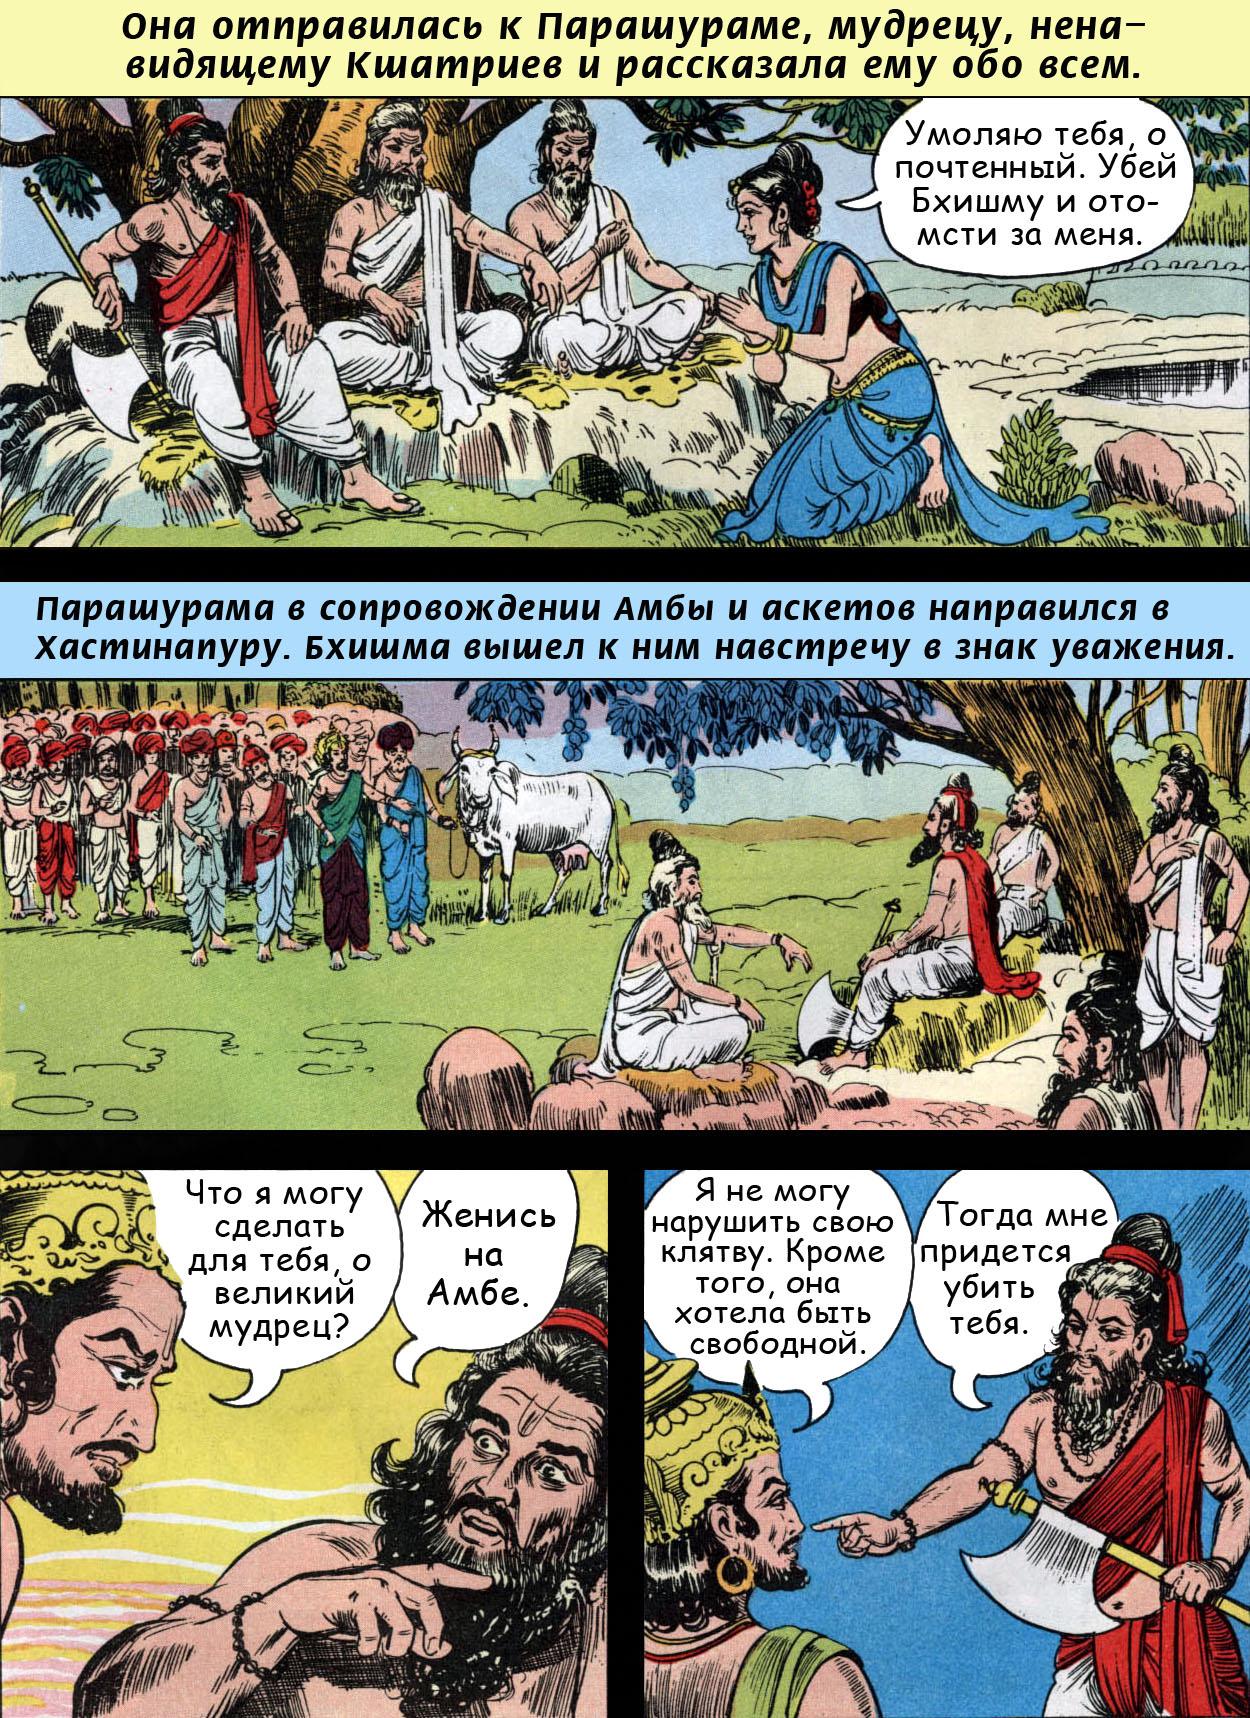 Бхишма 24 - ведический комикс